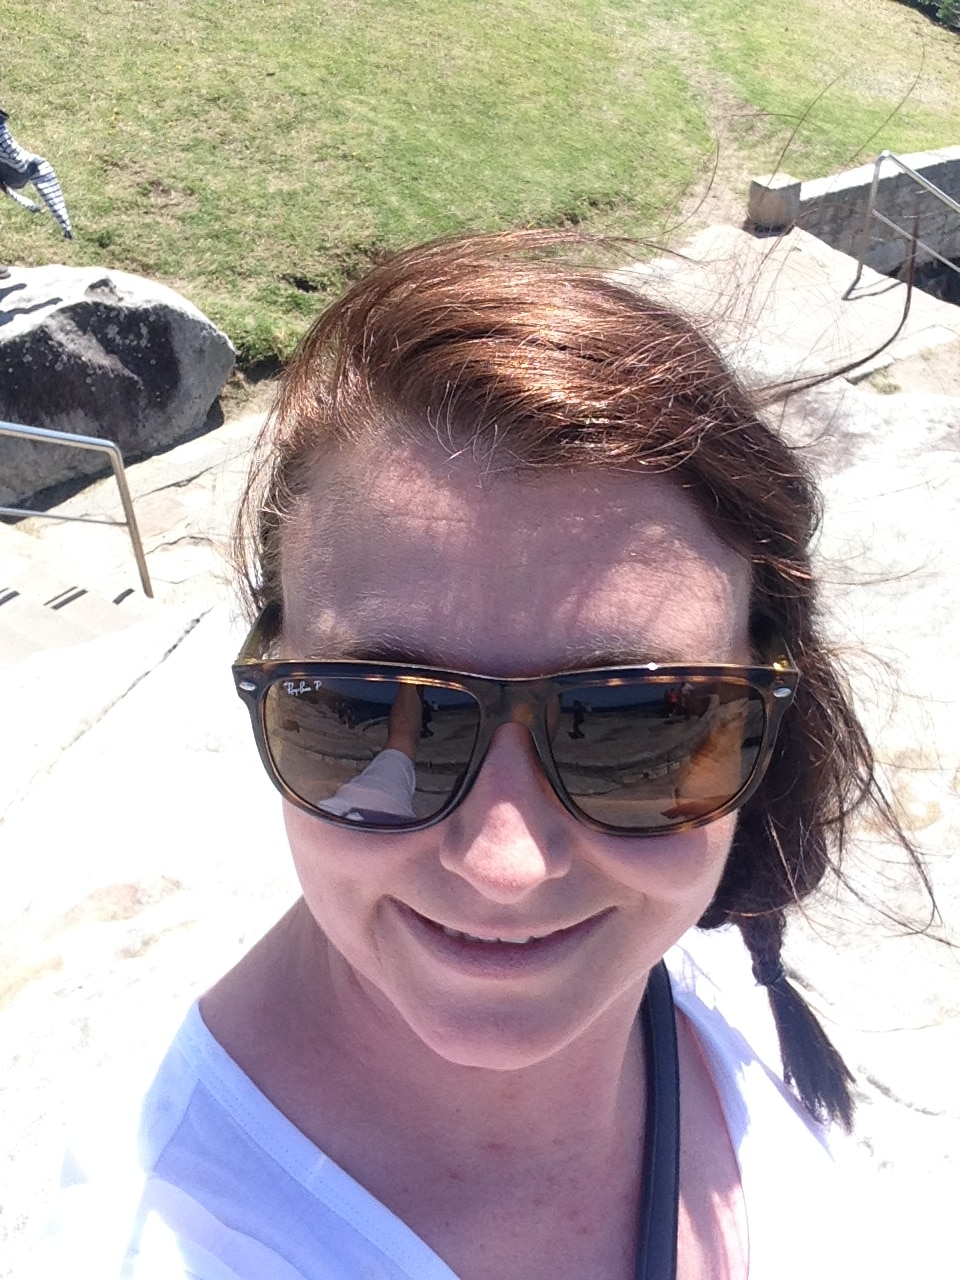 Rachel From Surry Hills, Australia